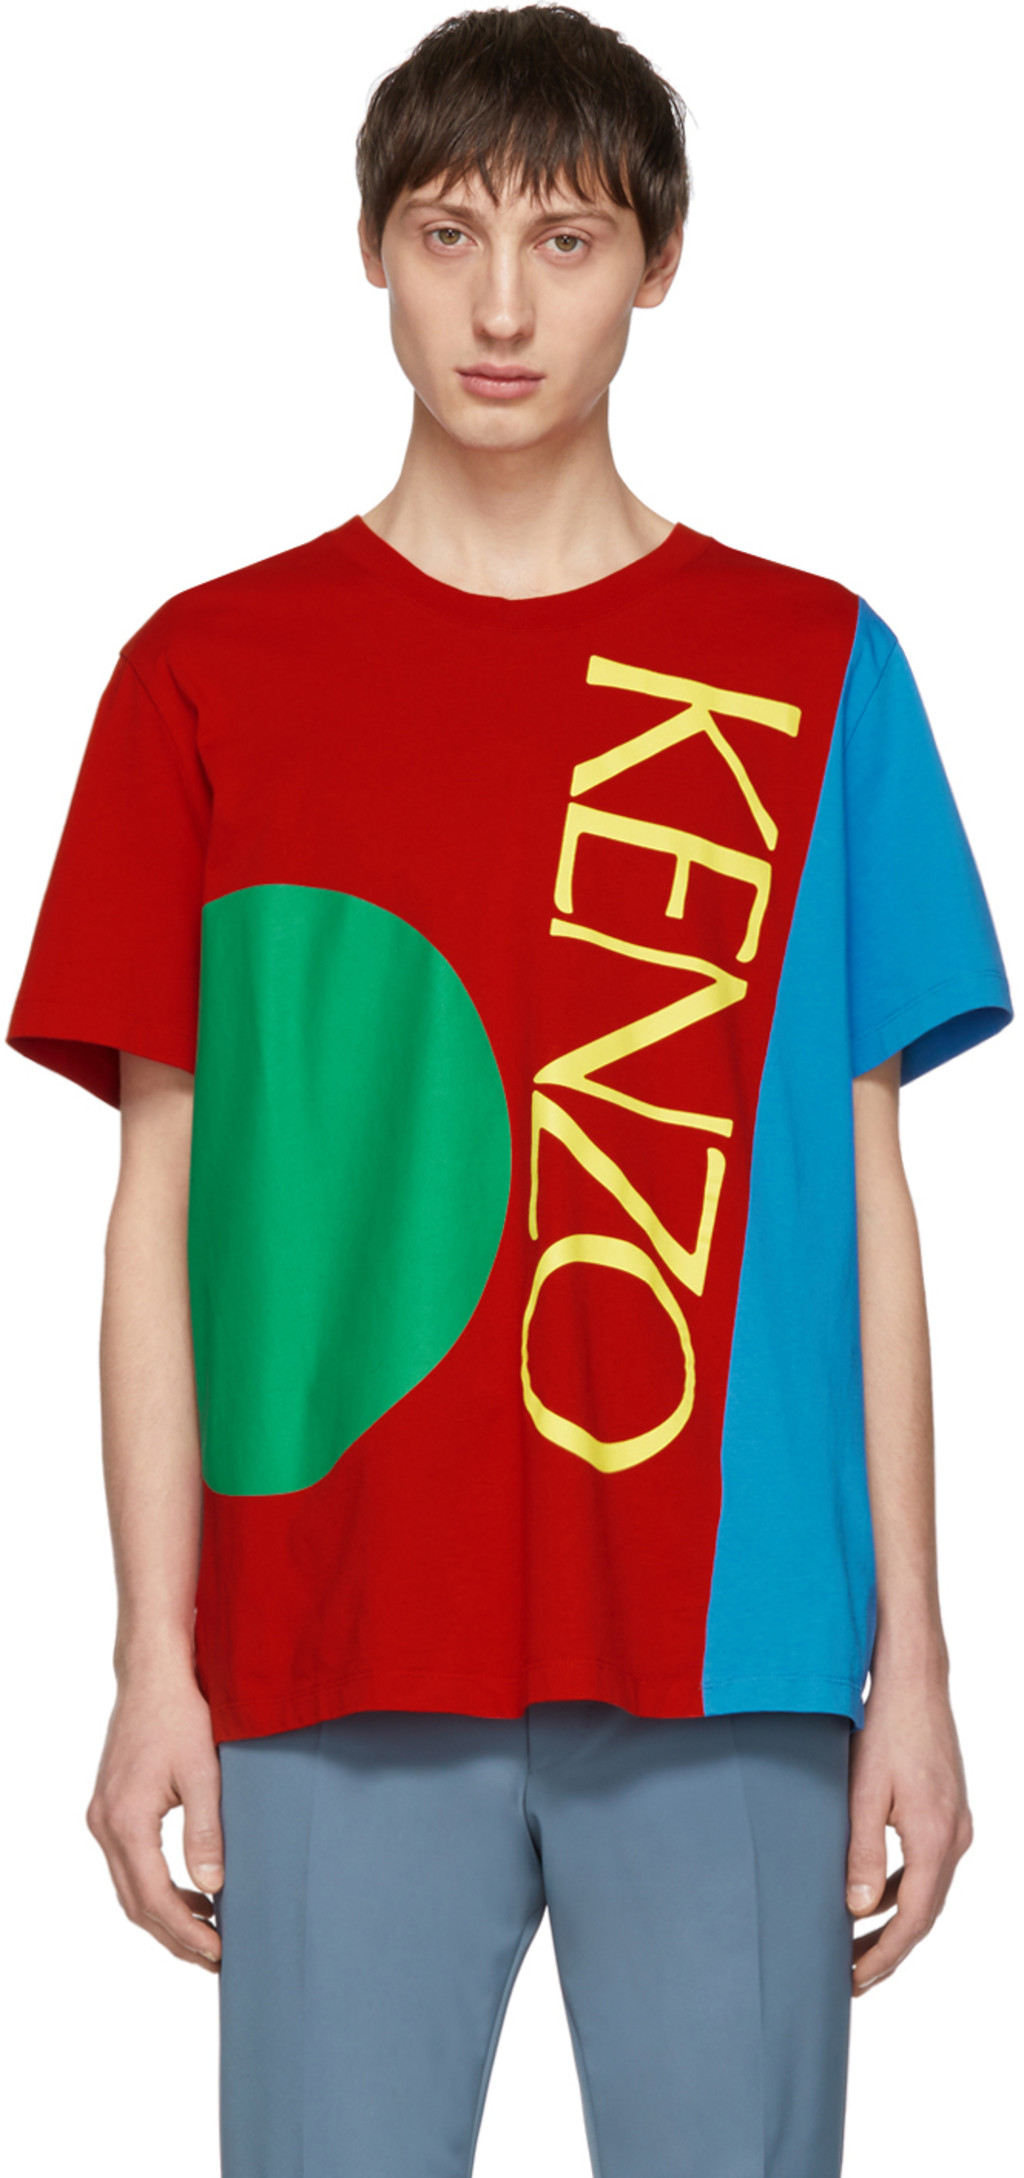 a6943ca0be Multicolor 'Square Logo' T-Shirt